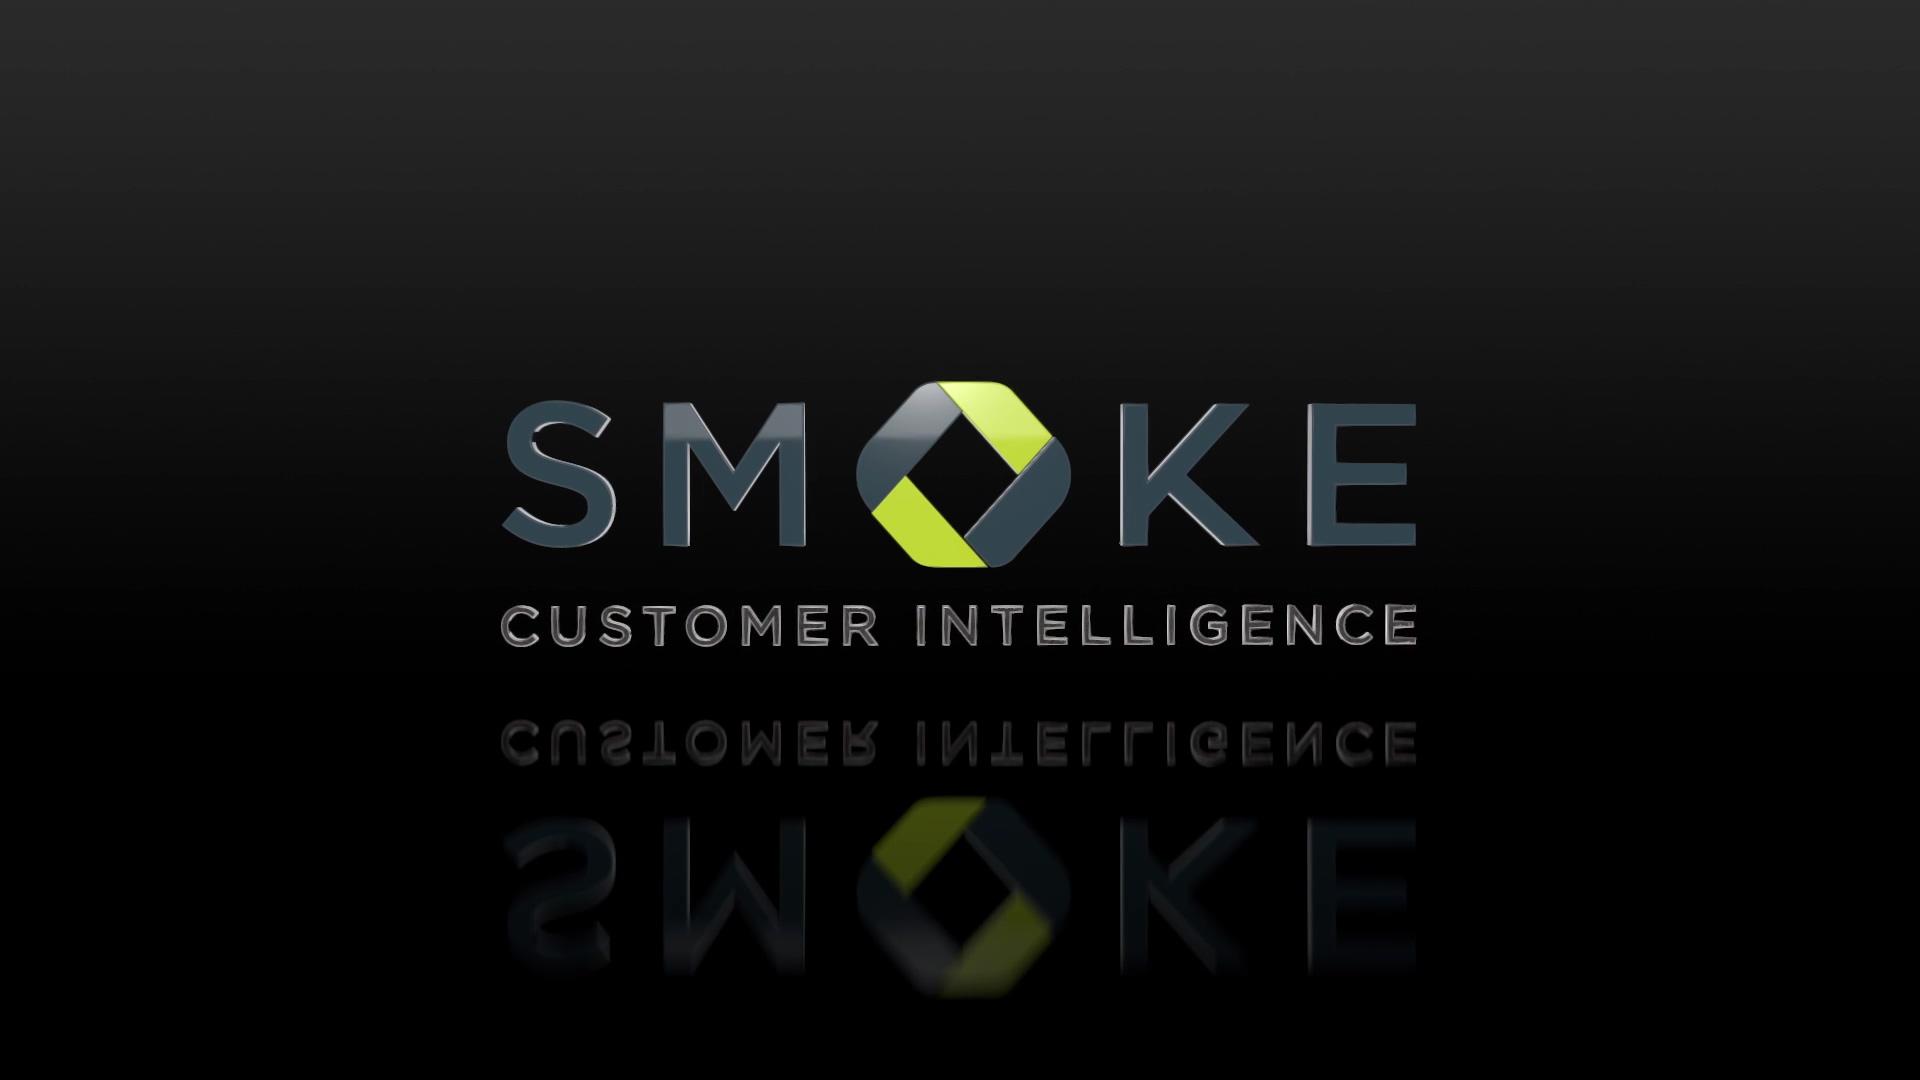 Smoke CUstomer Intelligence_THe DNA of a Survey_Sarah MacKenzie